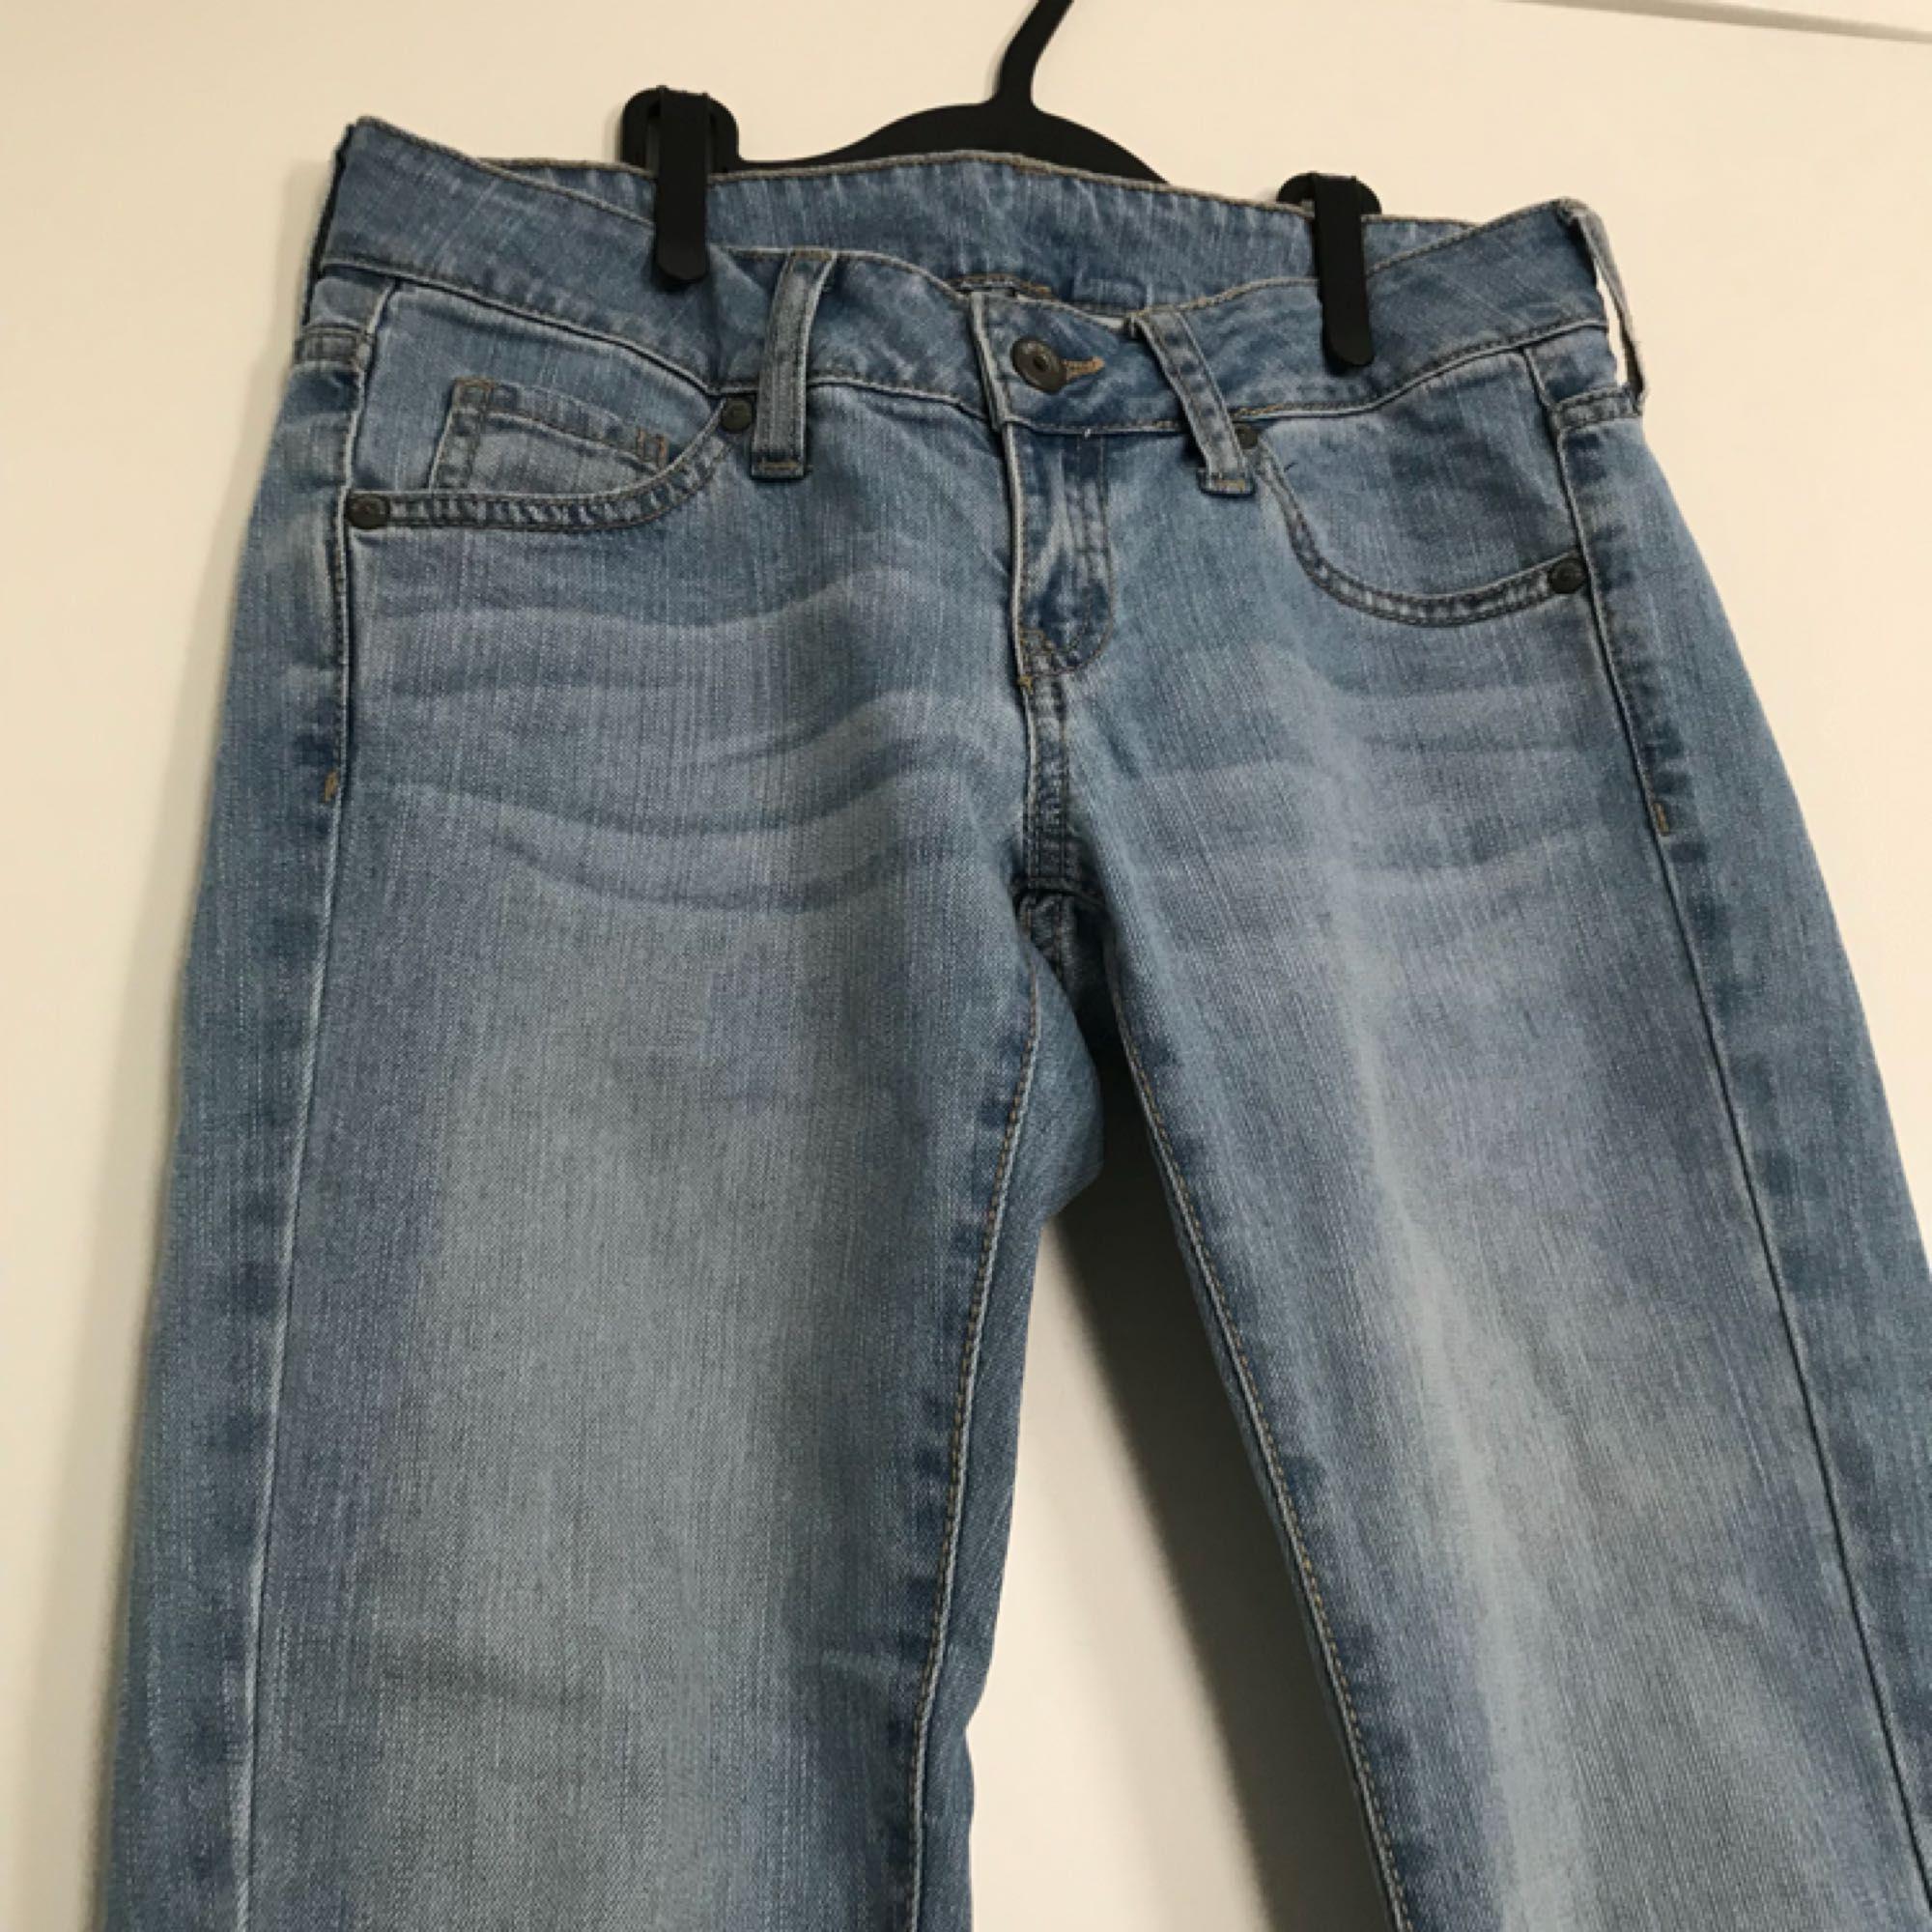 Ett par helt oanvända jeans fr - Jeans   Byxor - Second Hand 0cf630e4c169a